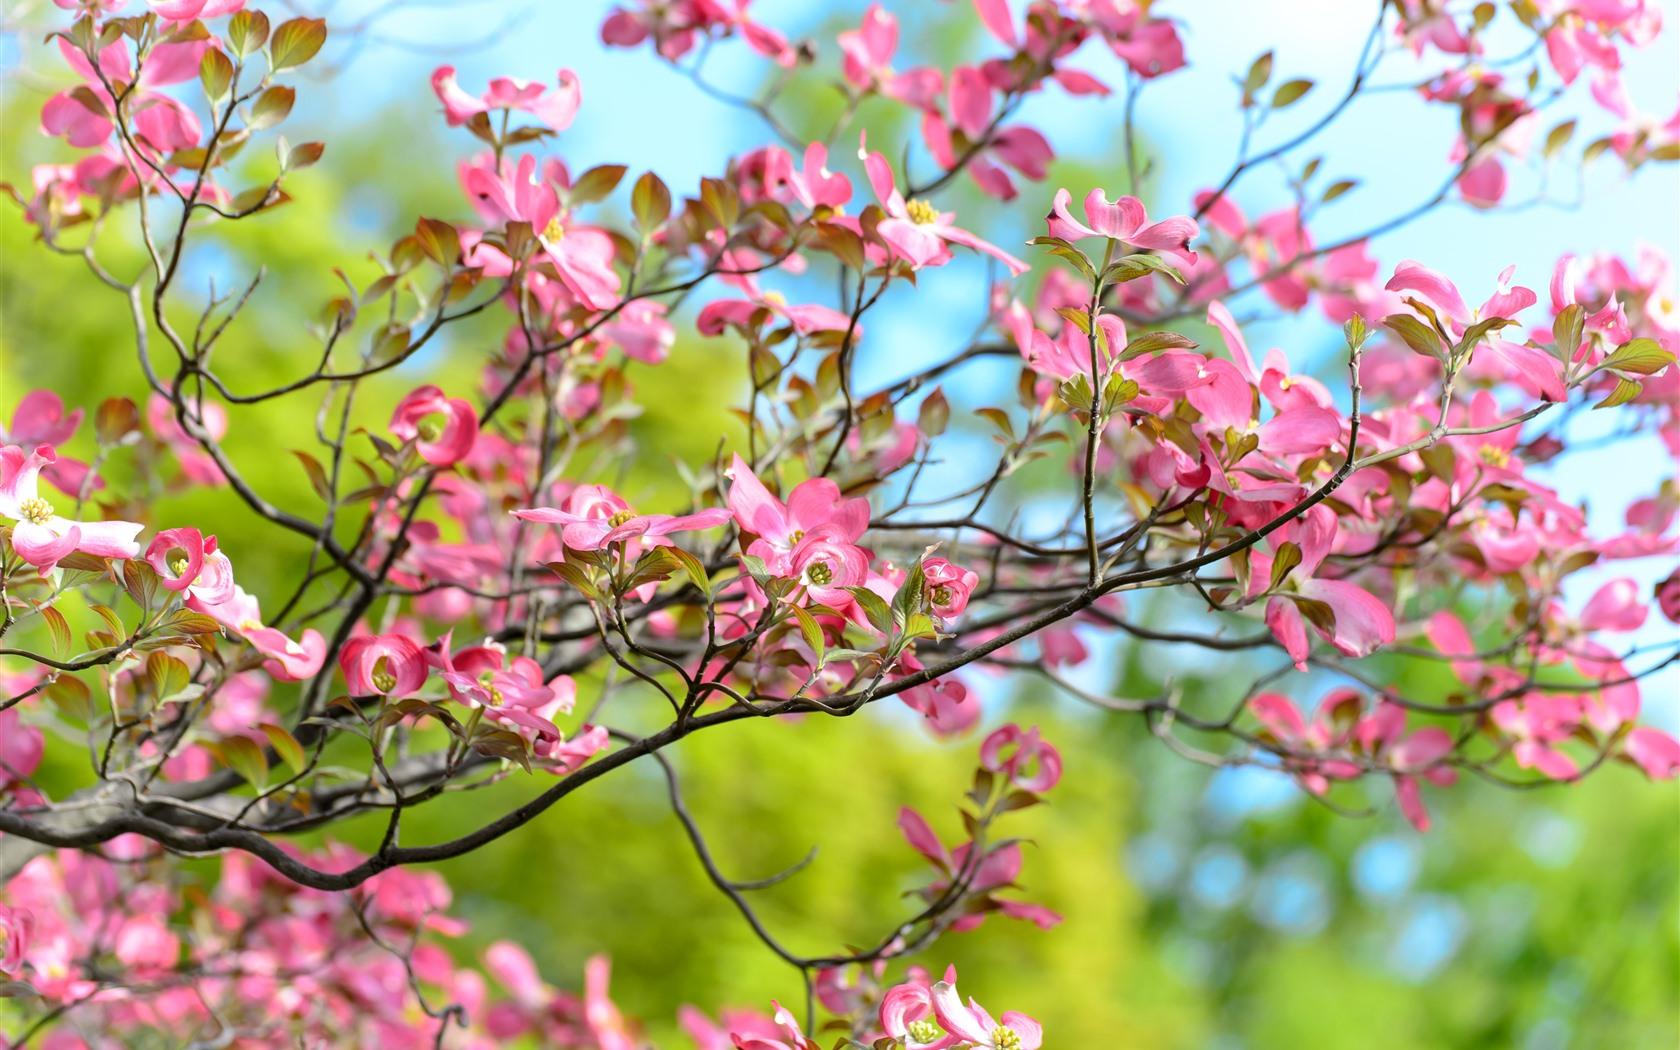 Fondos De Pantalla Flores Rosadas Crisantemo Fondo: Flores Rosas Florecen, Ramitas, Primavera. 1242x2688